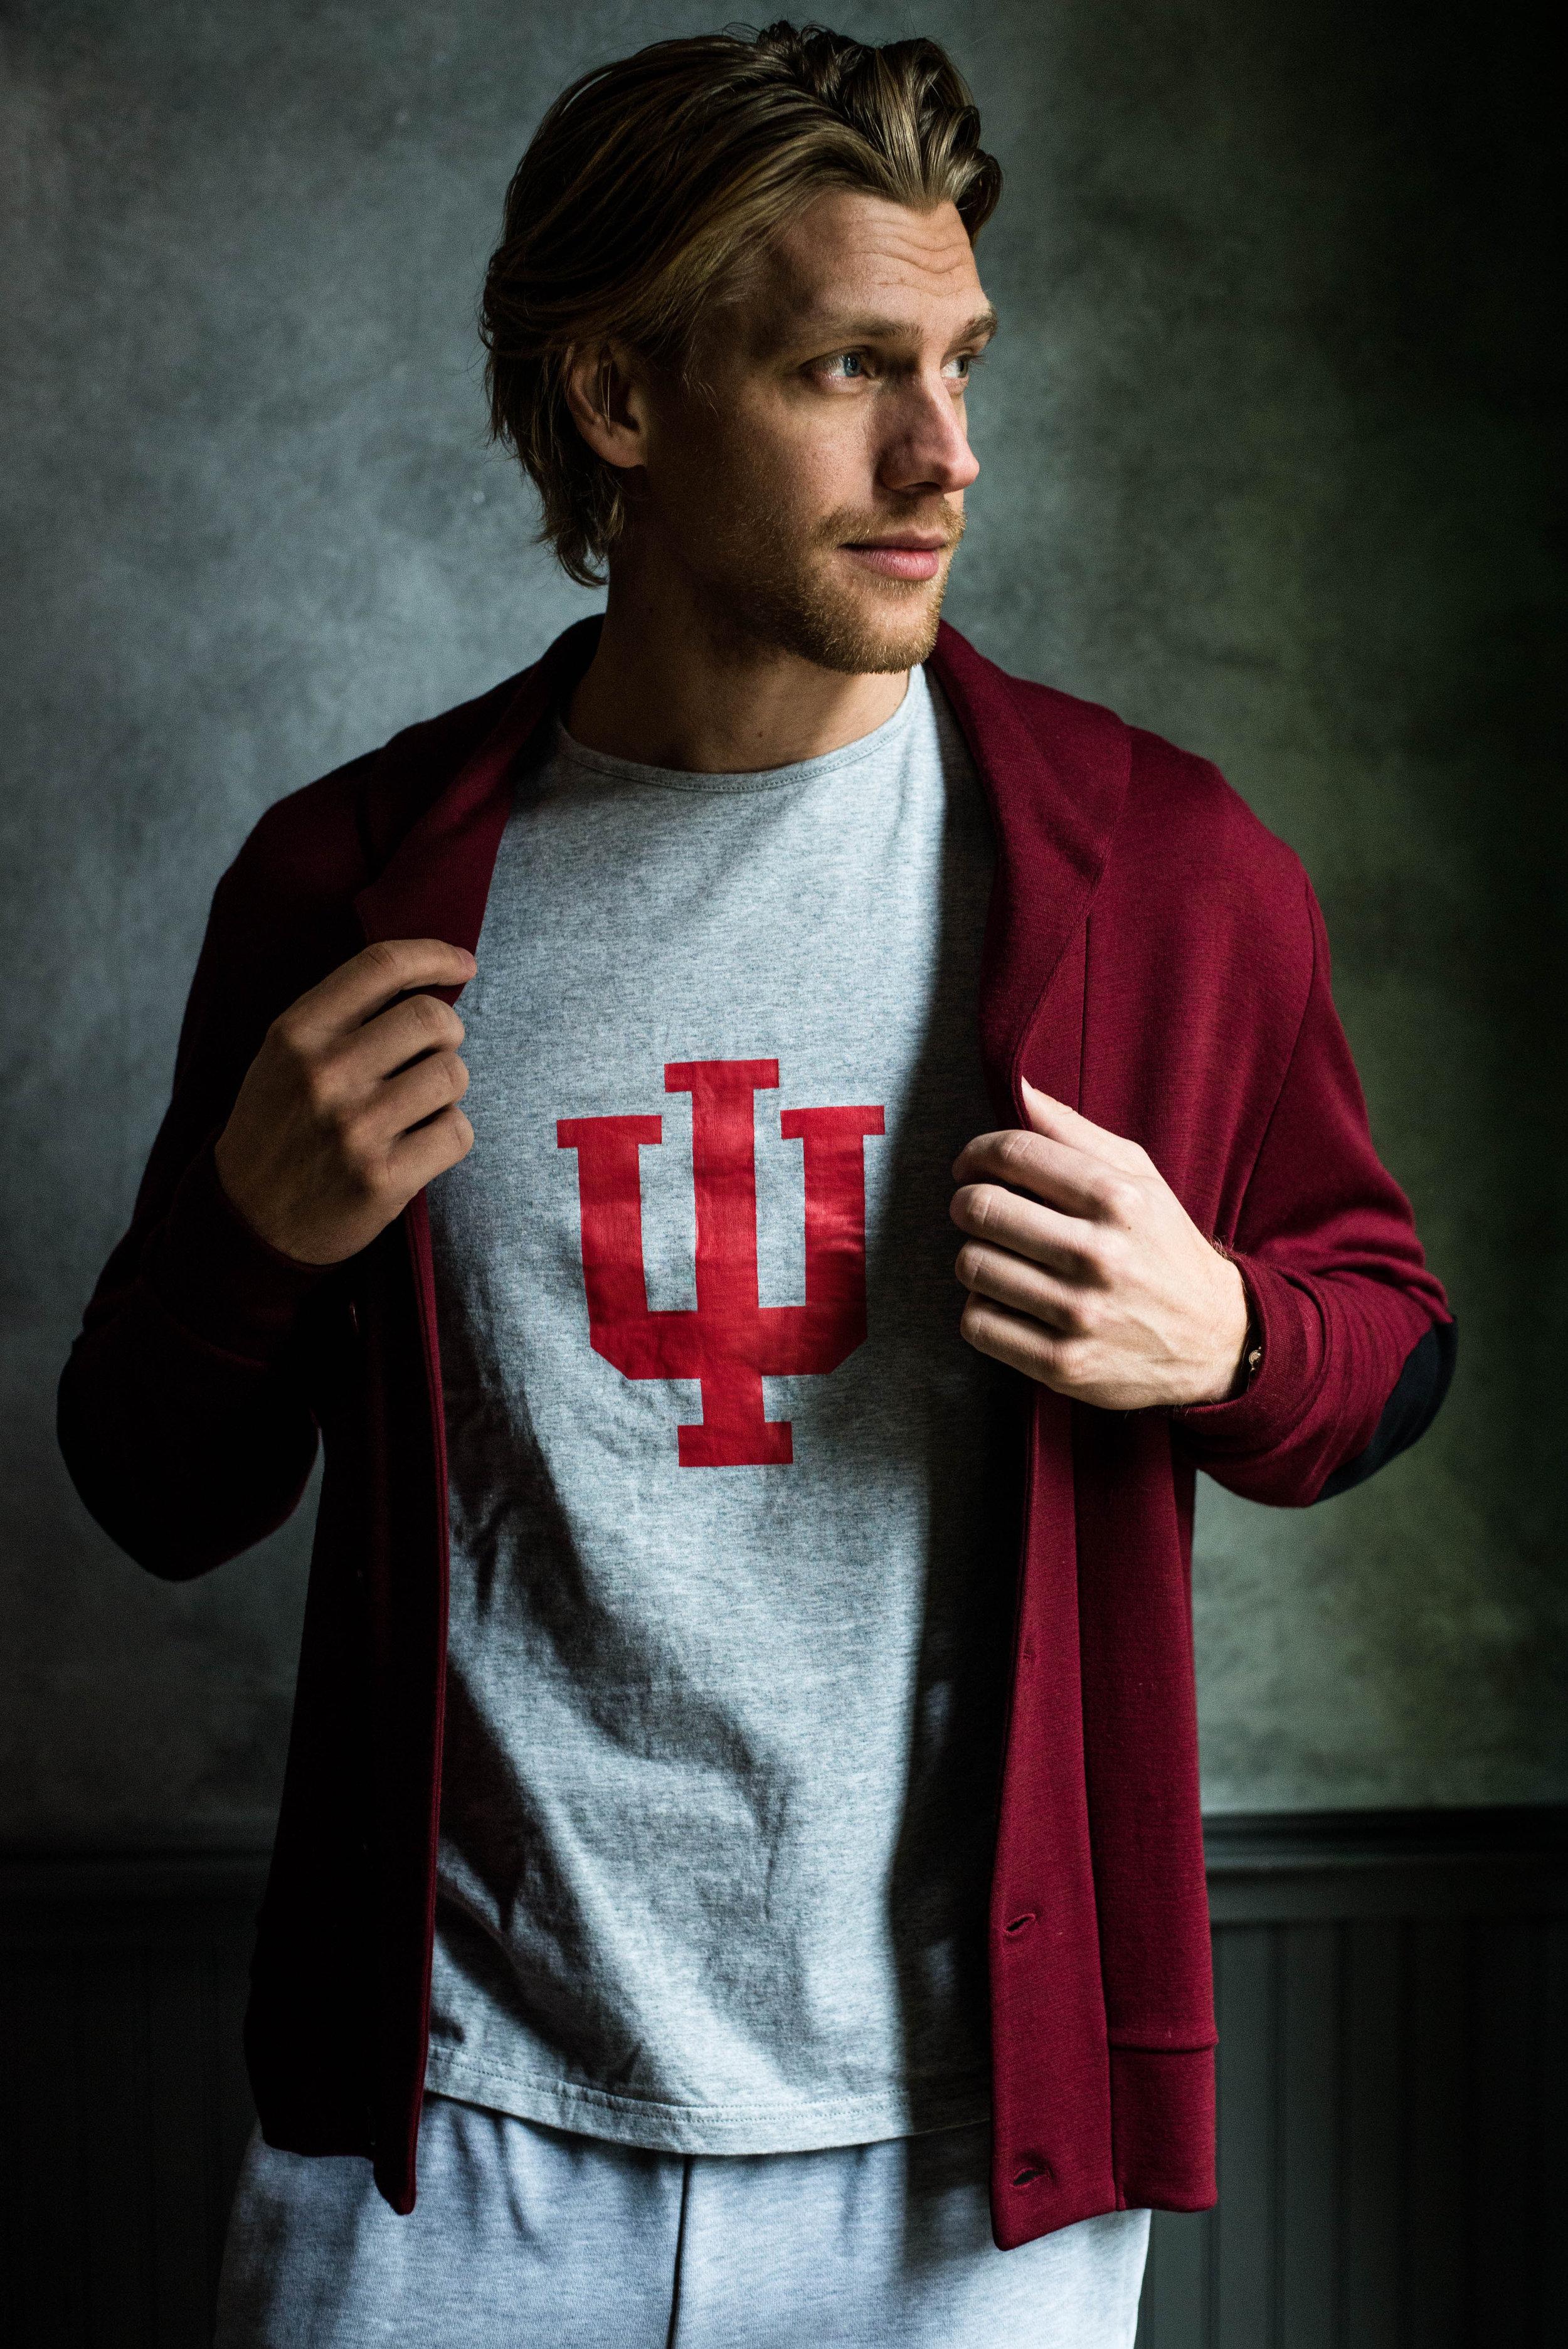 Grungy Gentleman x Indiana University 17.jpg